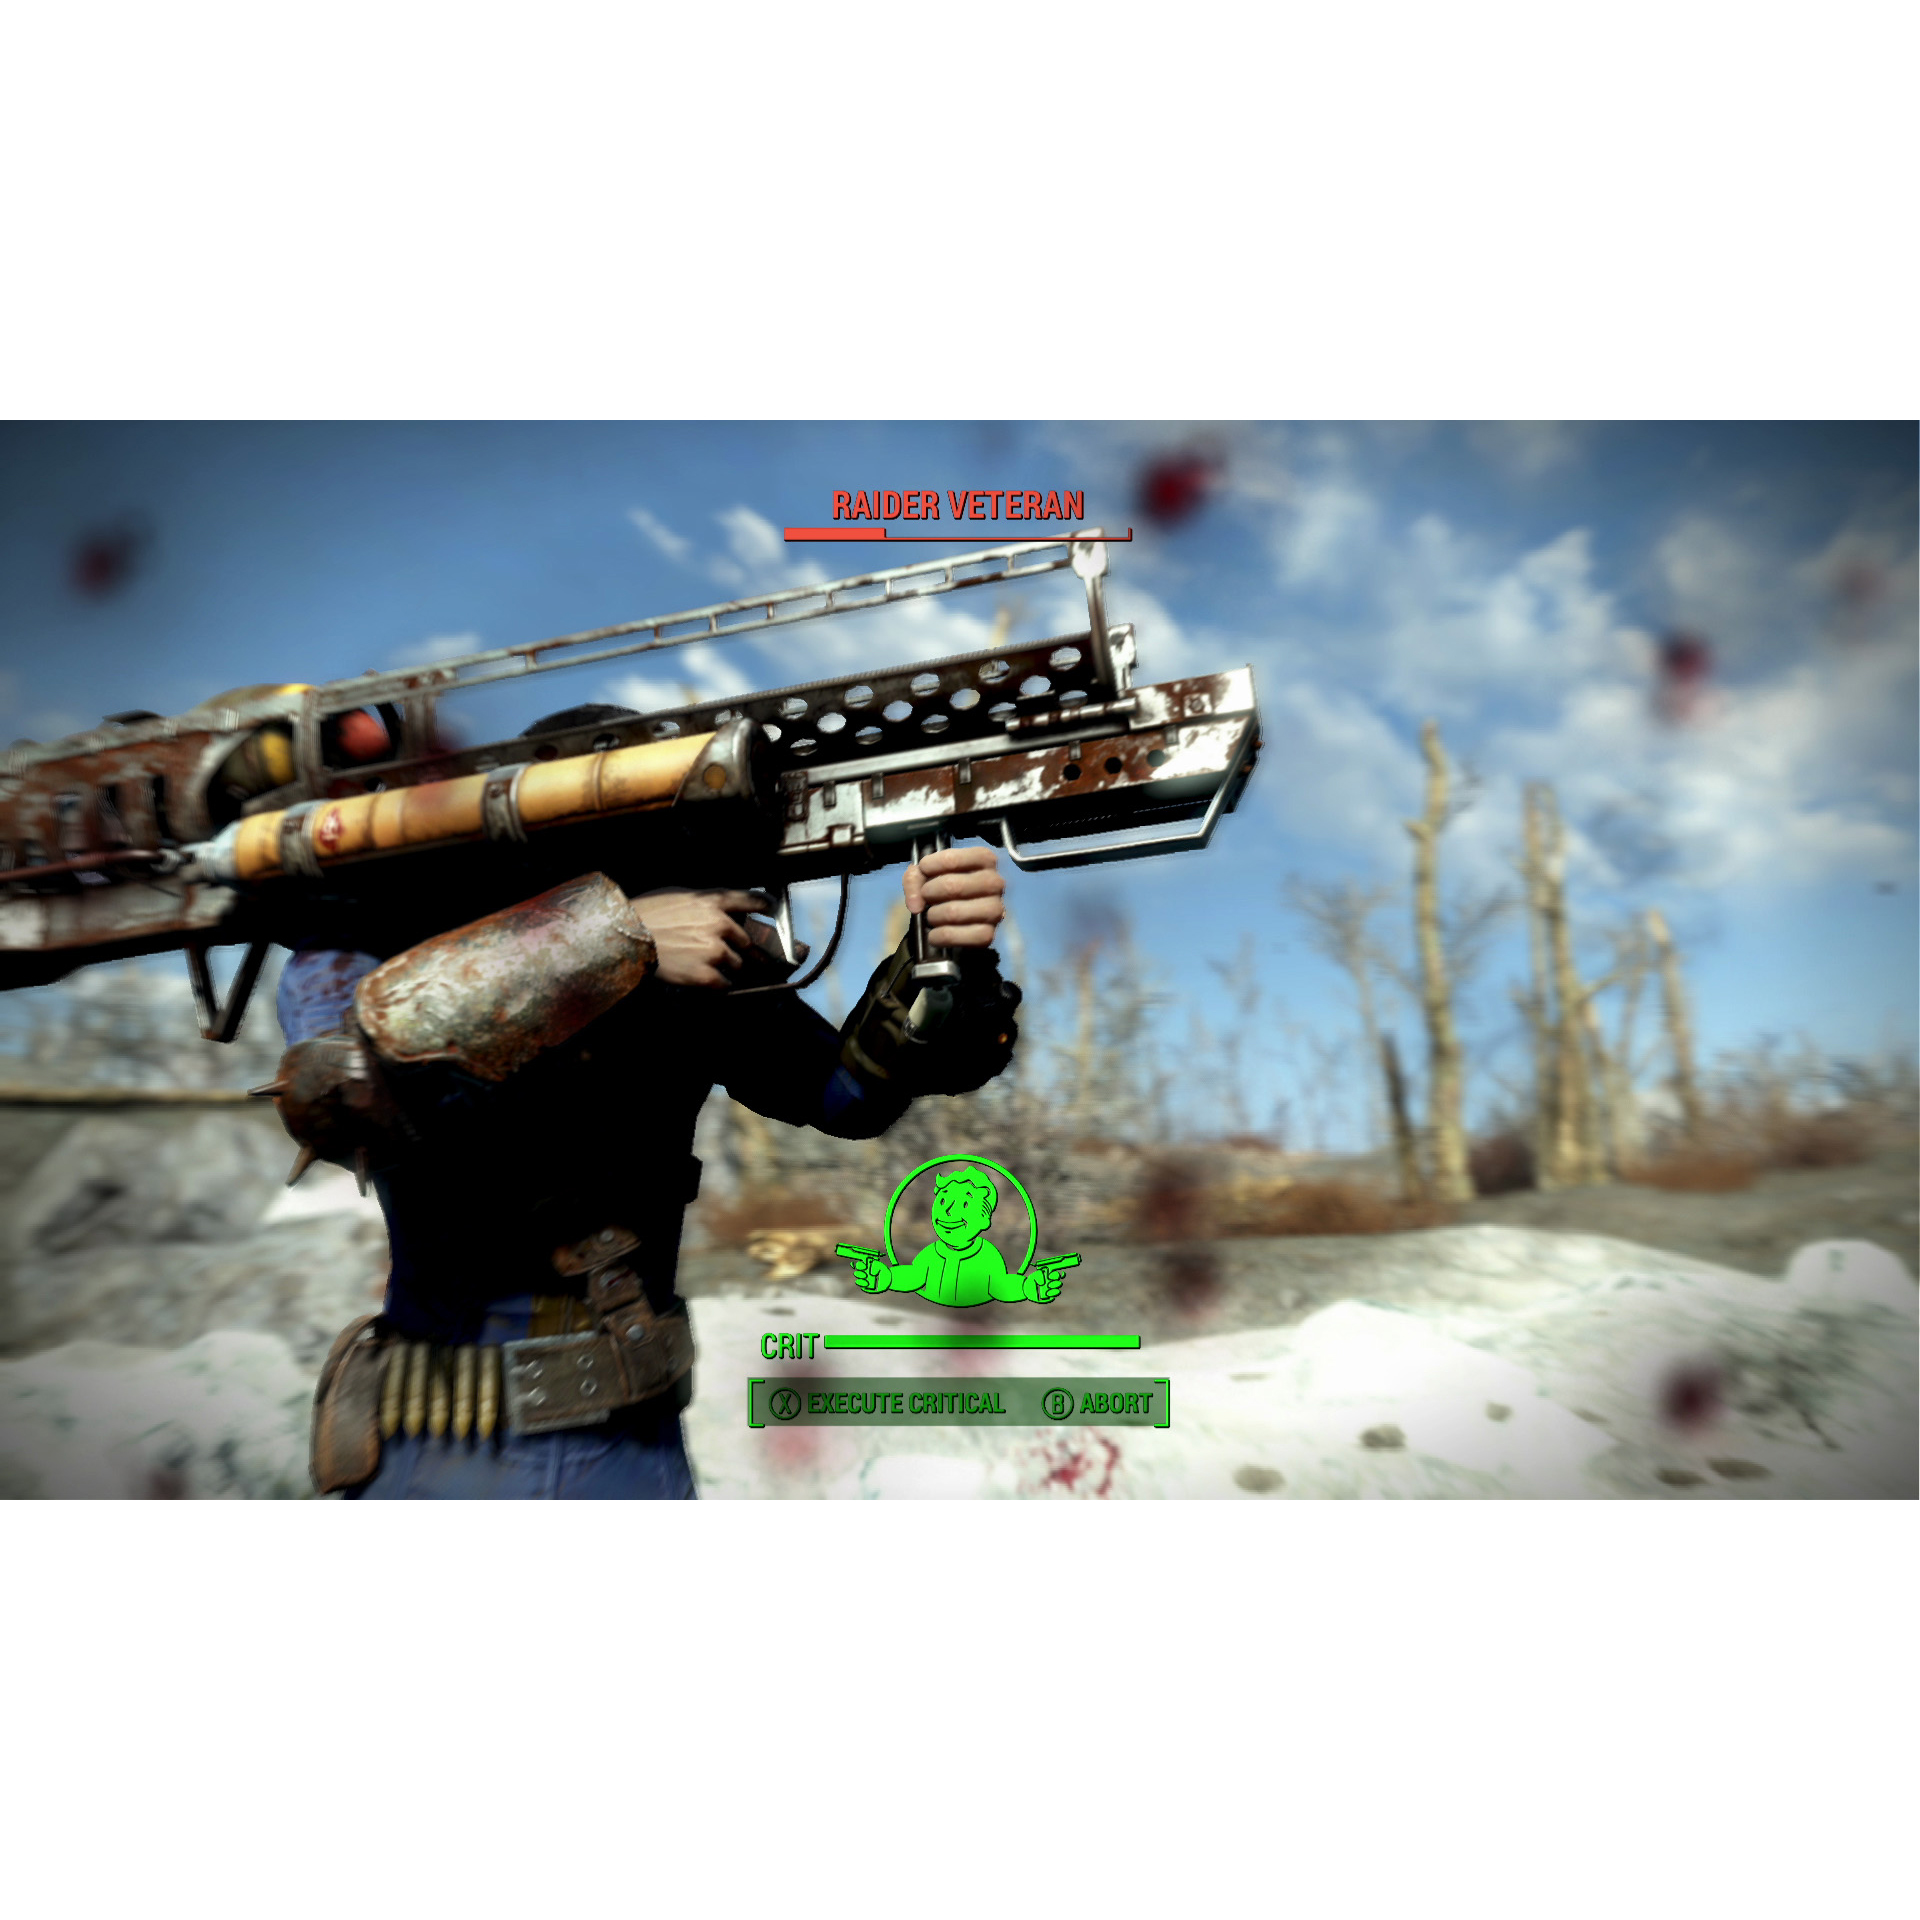 Joc Fallout 4 Goty pentru PlayStation 4 20